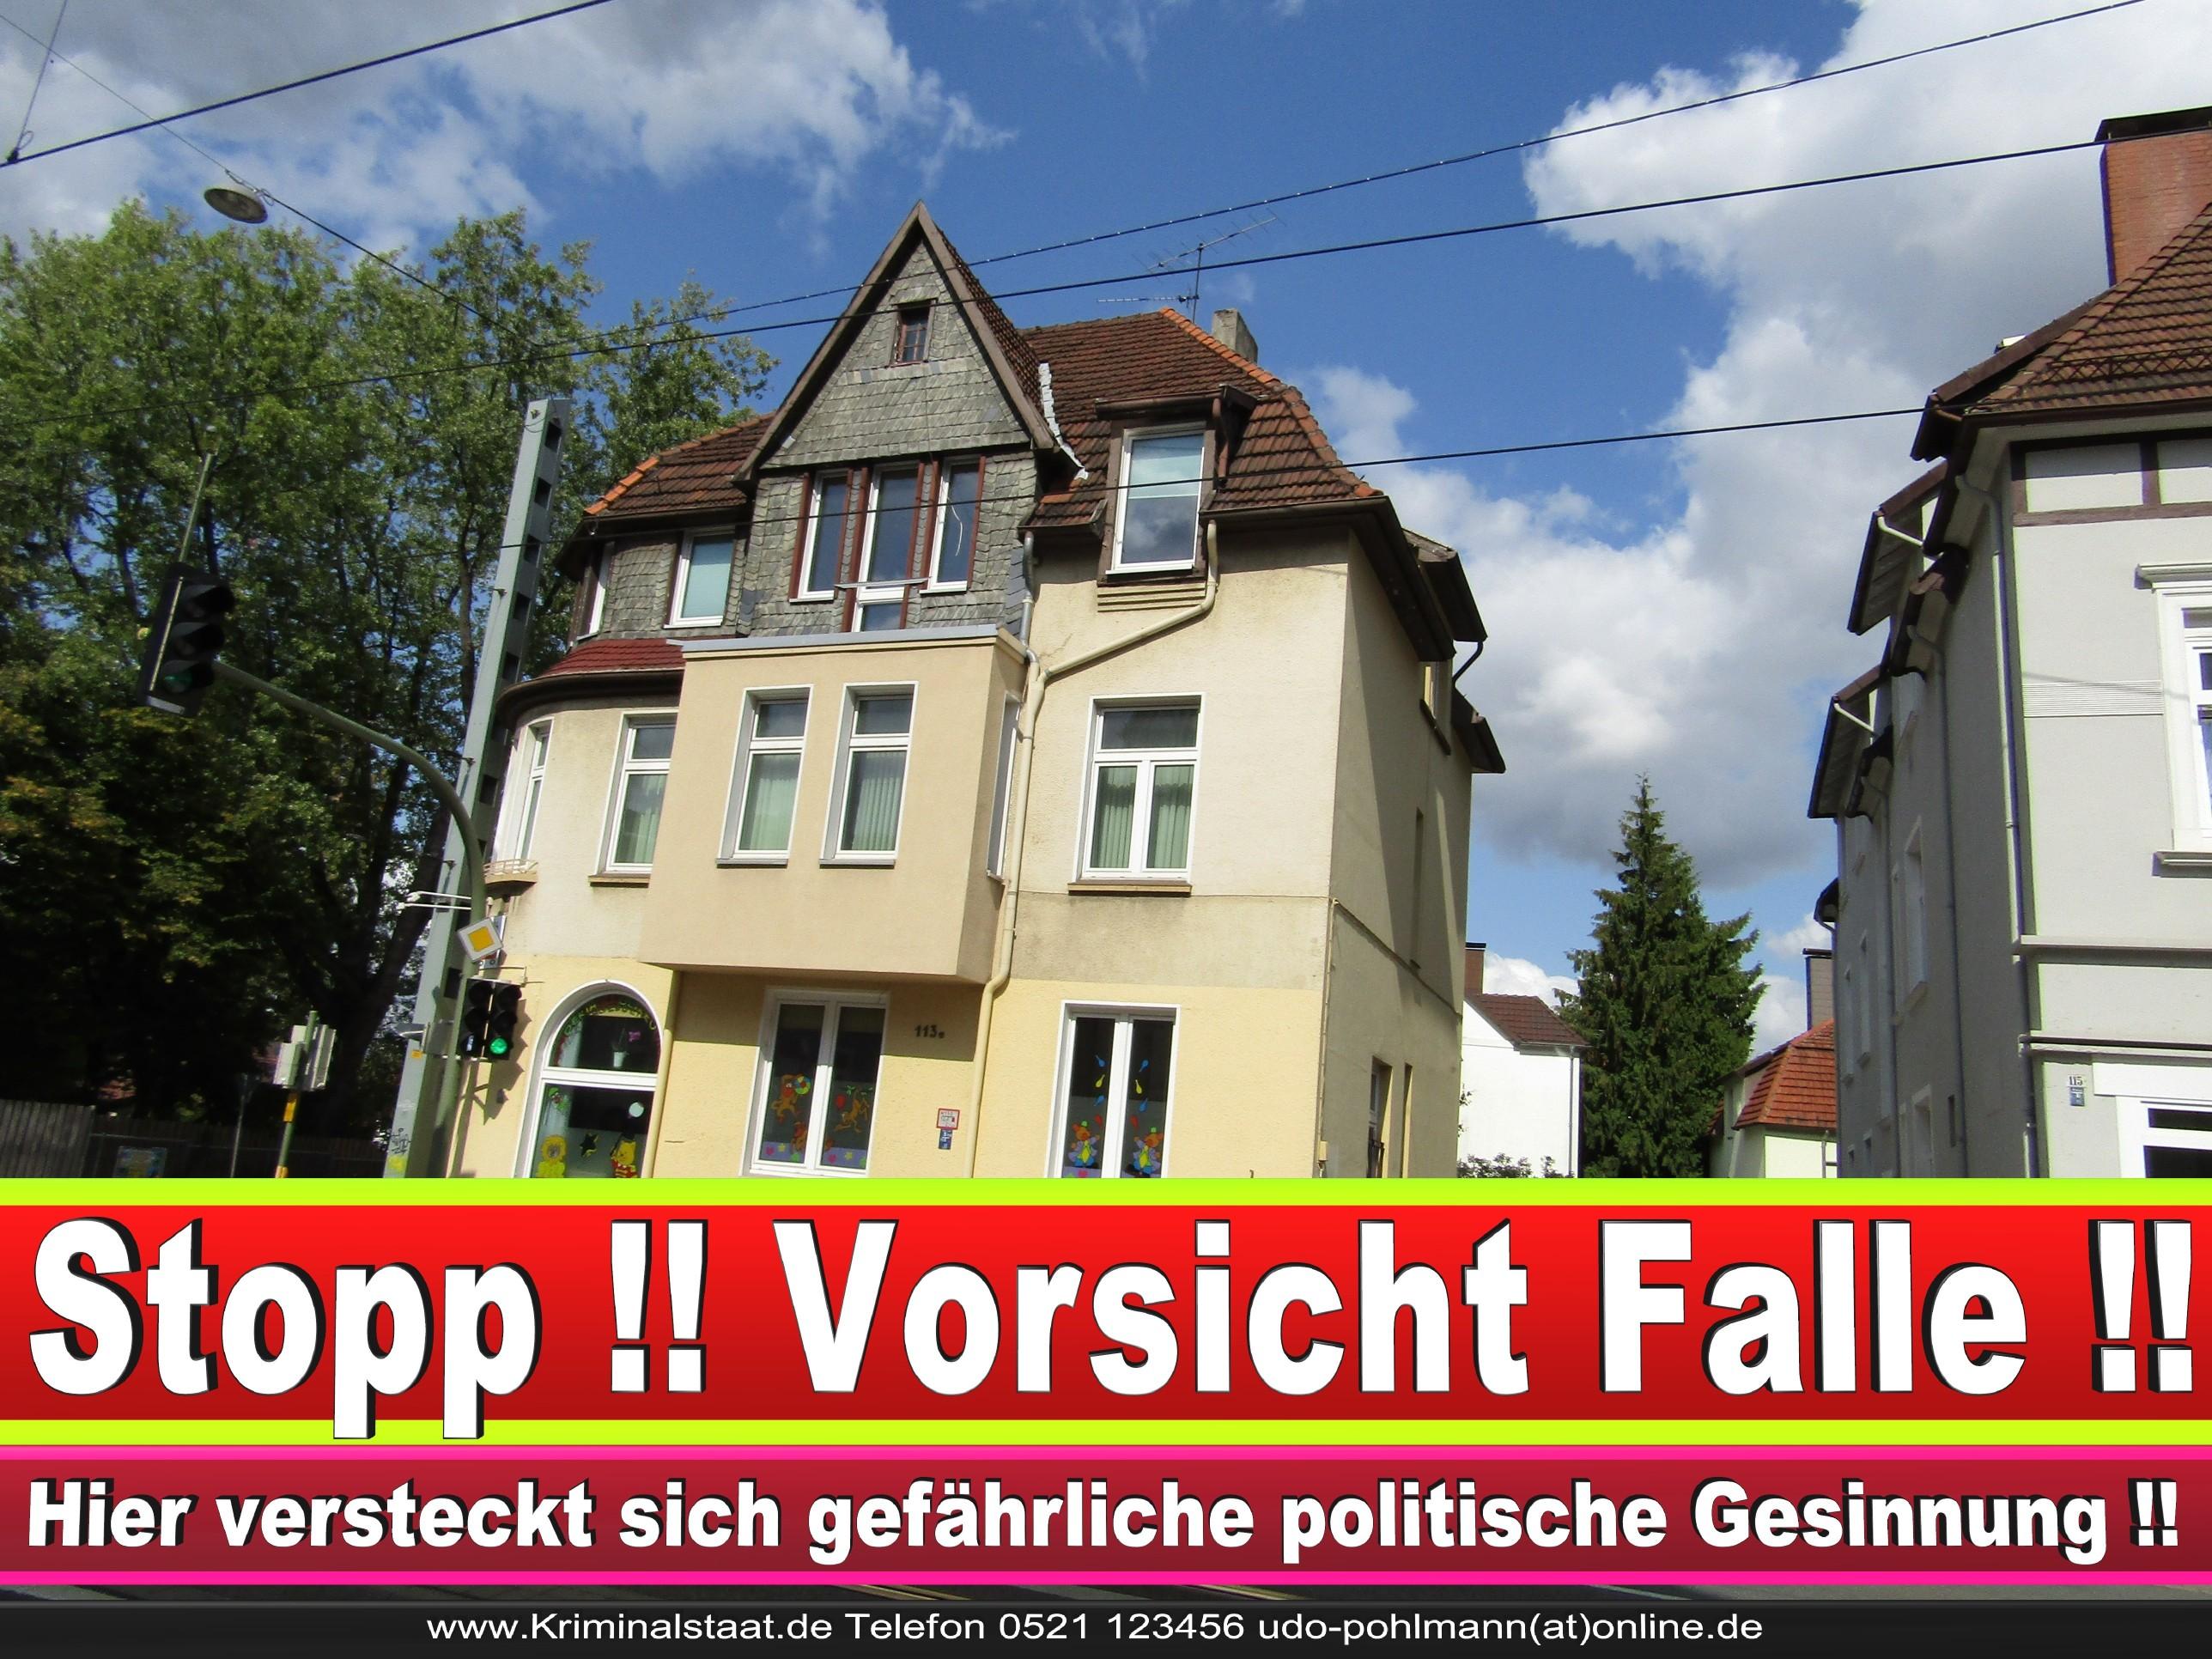 WILLI BLUMENSAAT CDU BIELEFELD 1 LANDTAGSWAHL BUNDESTAGSWAHL BÜRGERMEISTERWAHL